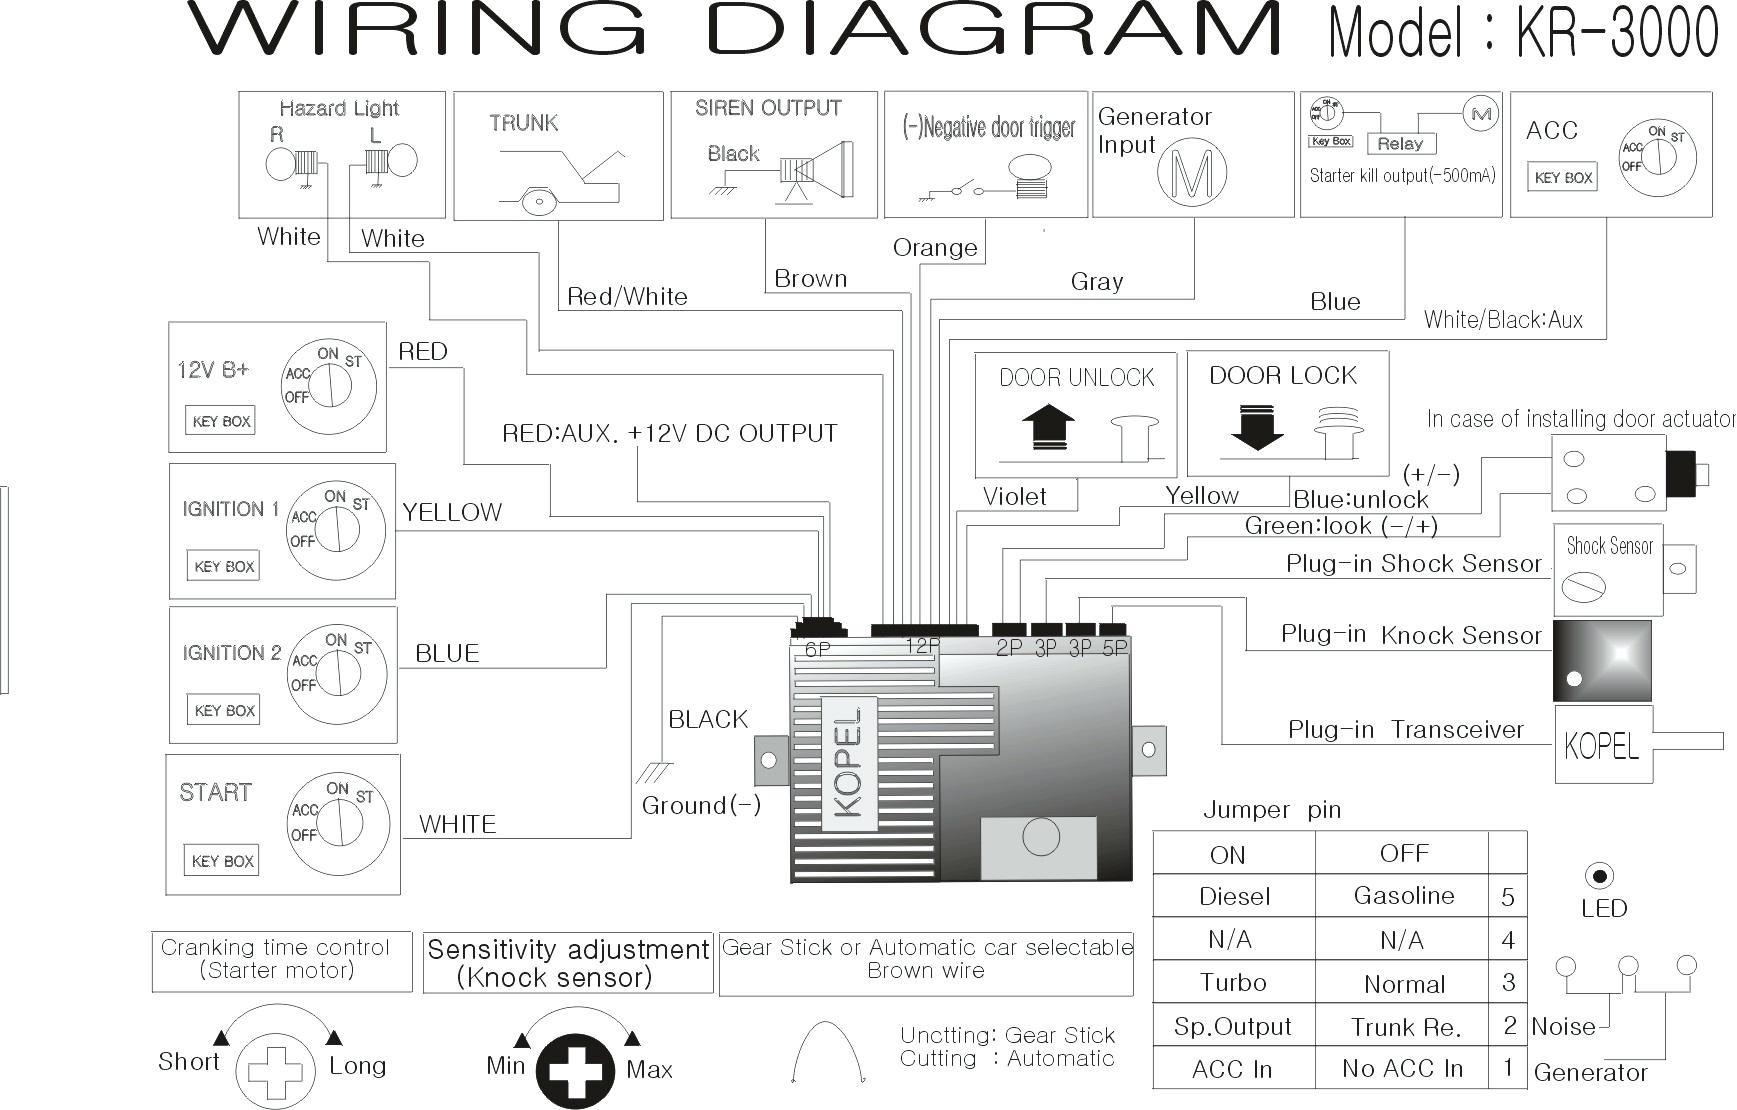 Car Alarm System Wiring Diagram Car Security System Wiring Diagram Copy Wiring Diagram for Ceiling Of Car Alarm System Wiring Diagram